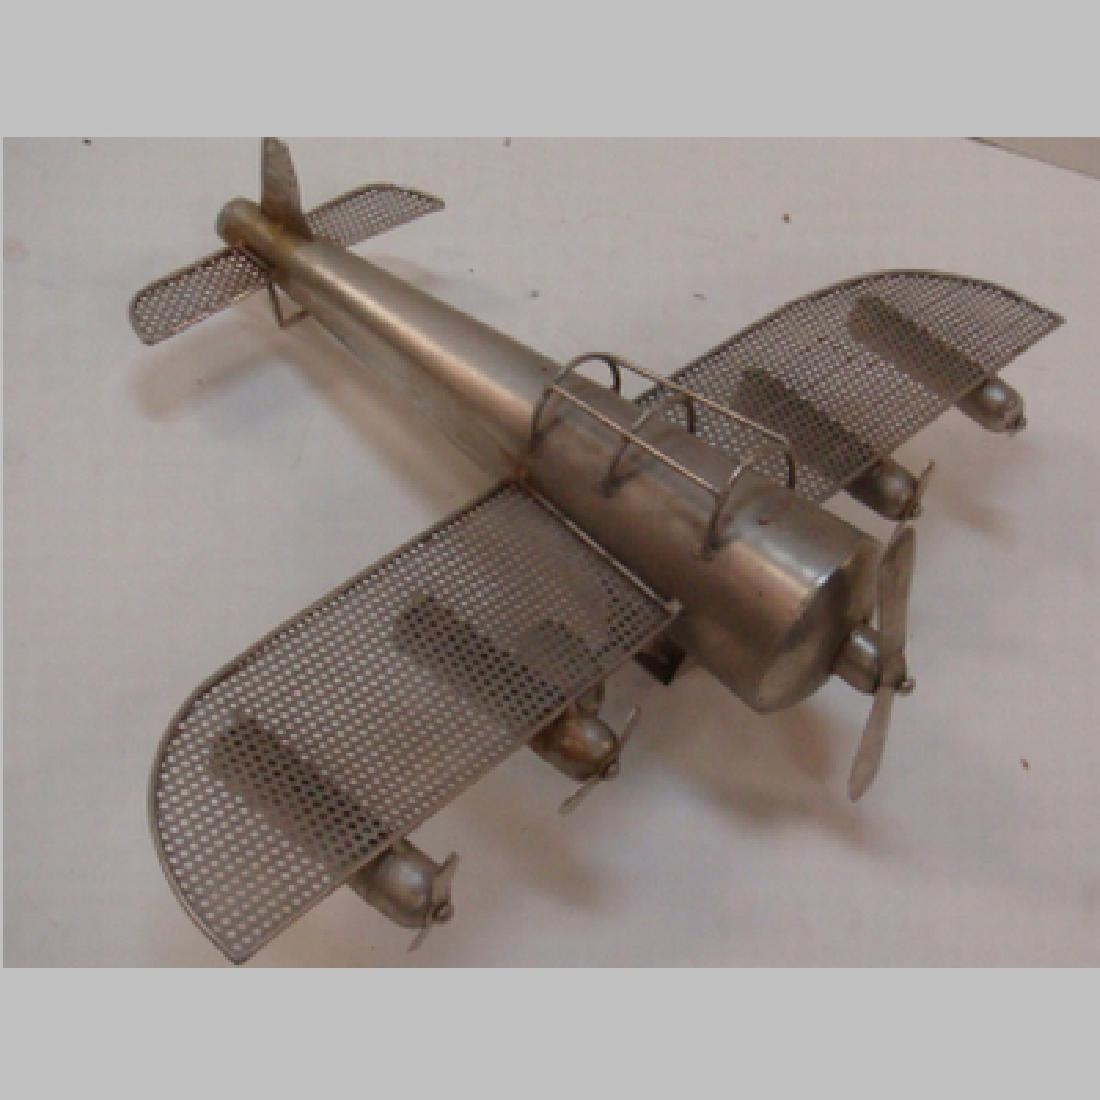 WW II Era Silver Metal Toy Five Engine Bomber: